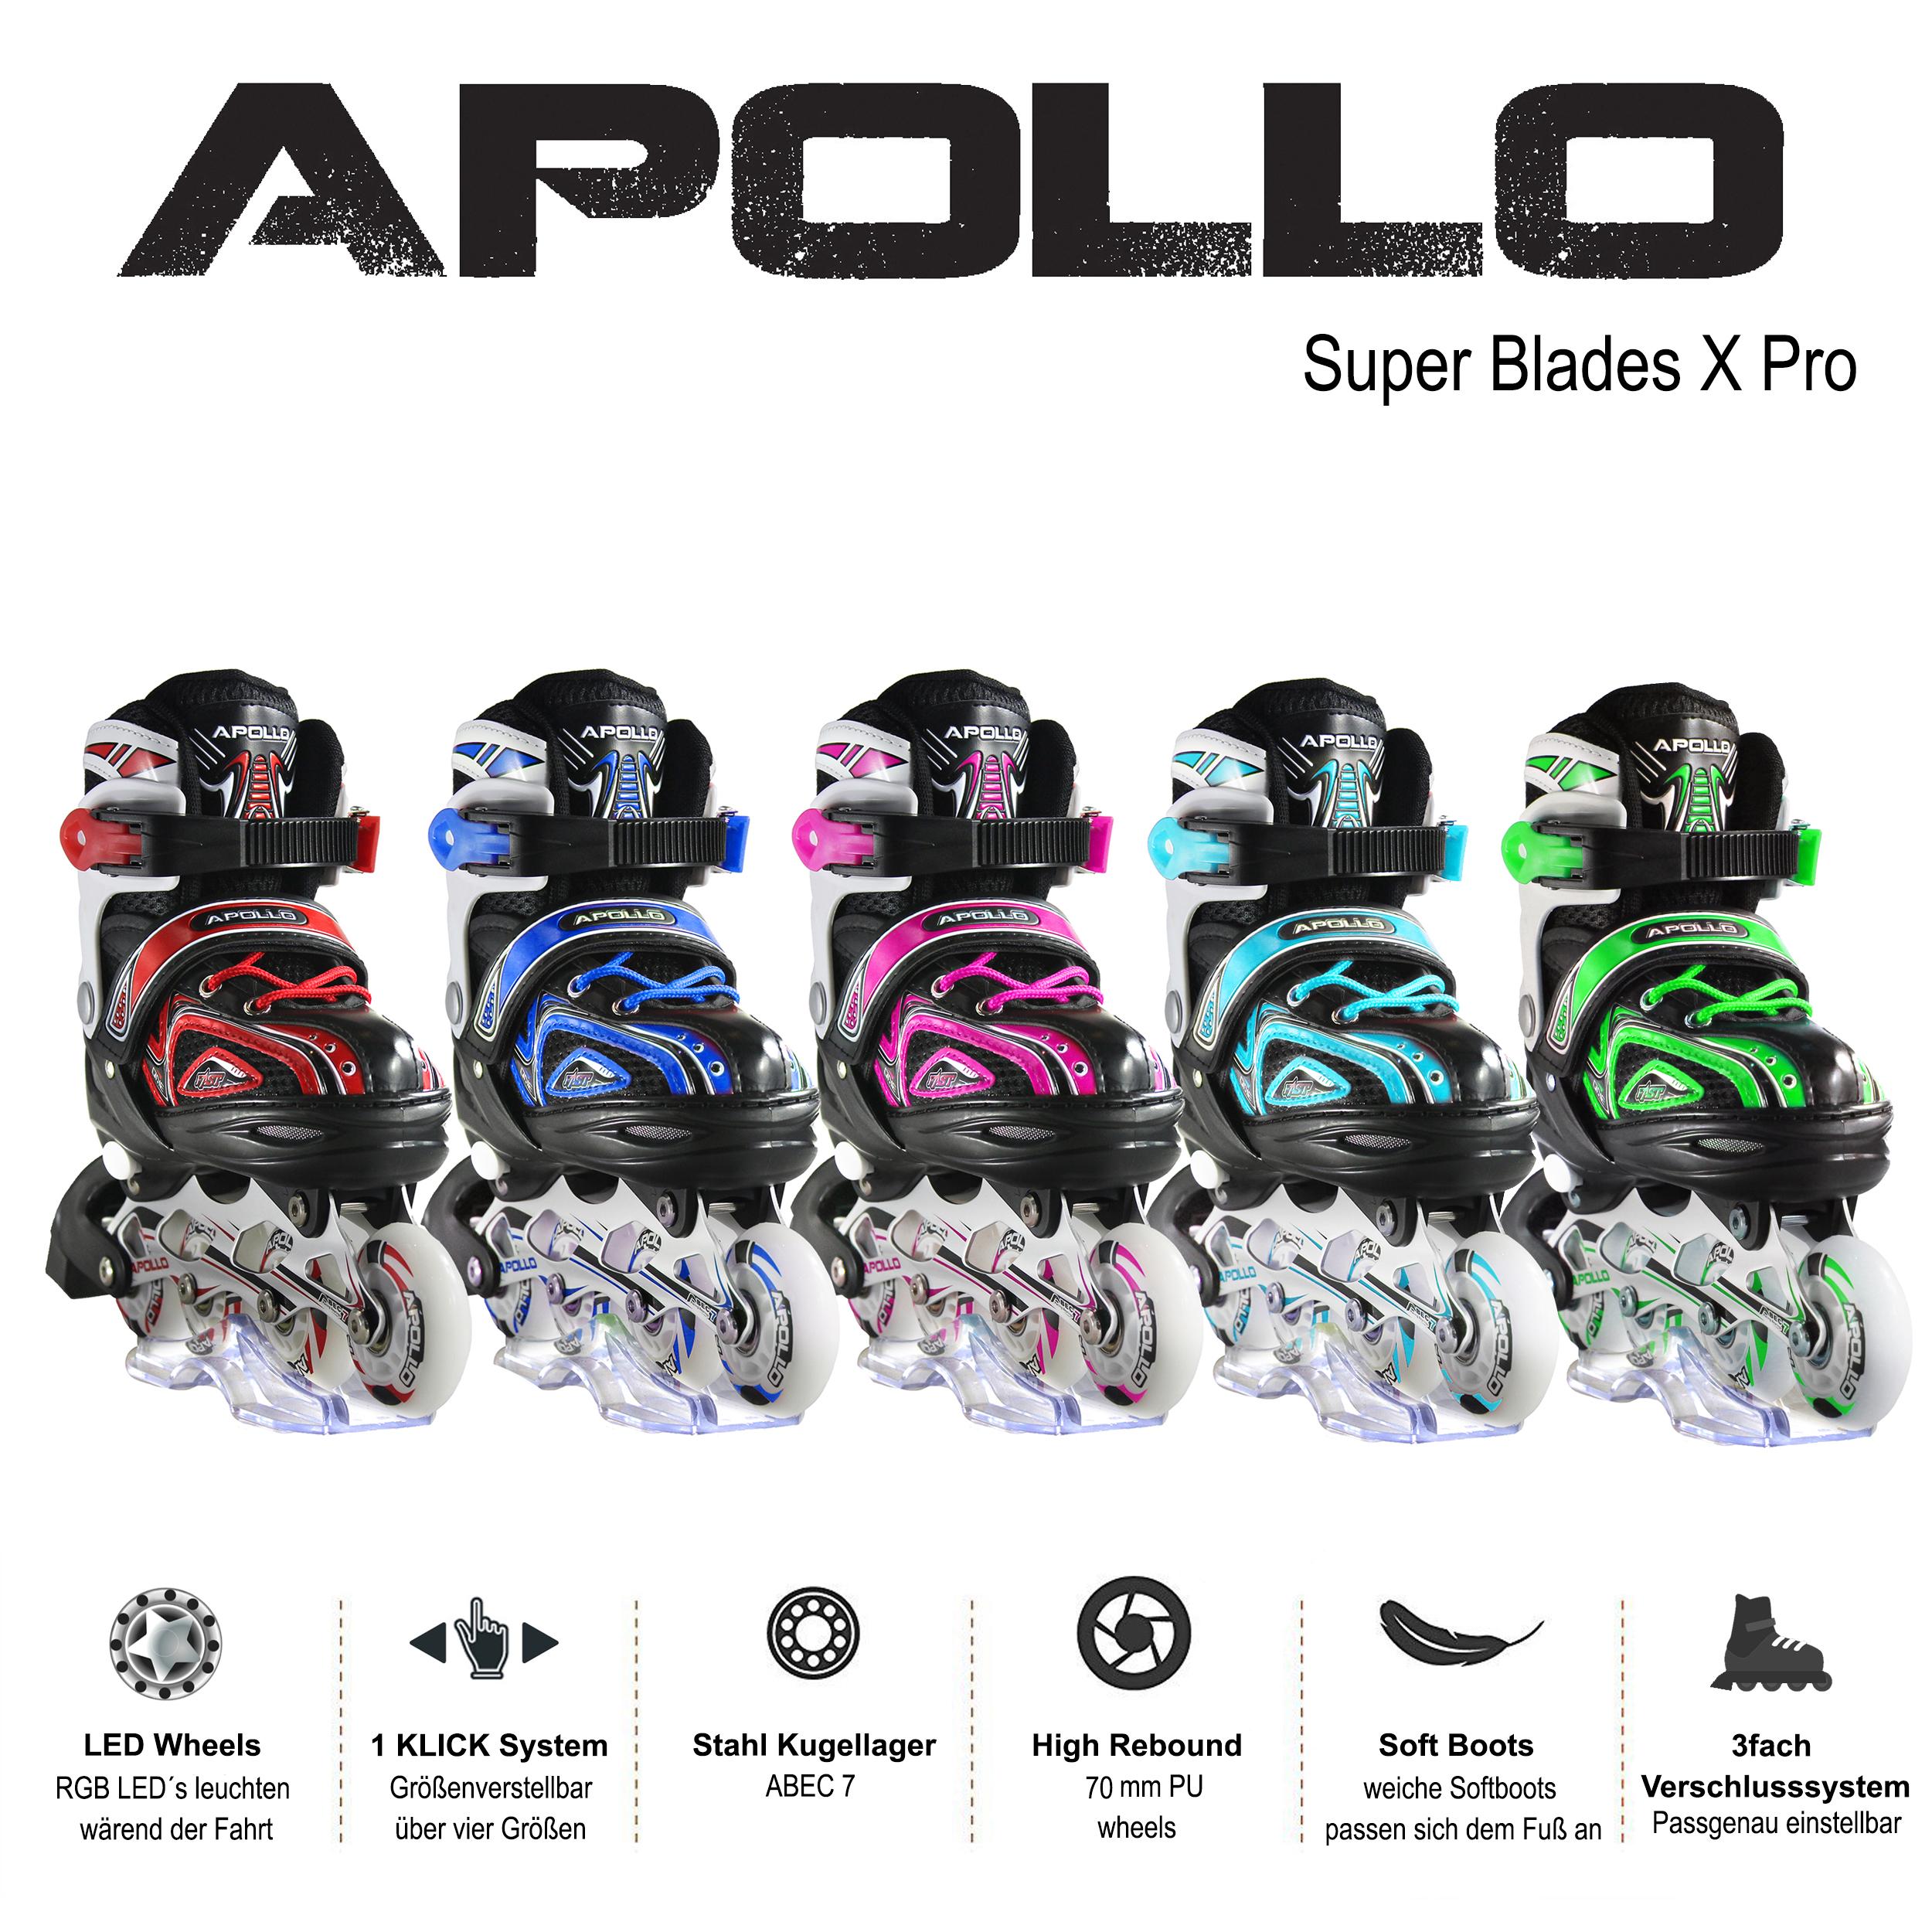 35-38 verstellbar Kinder Inliner Inlineskates Rollschuhe mit LED ABEC-7 Größe Inlineskating